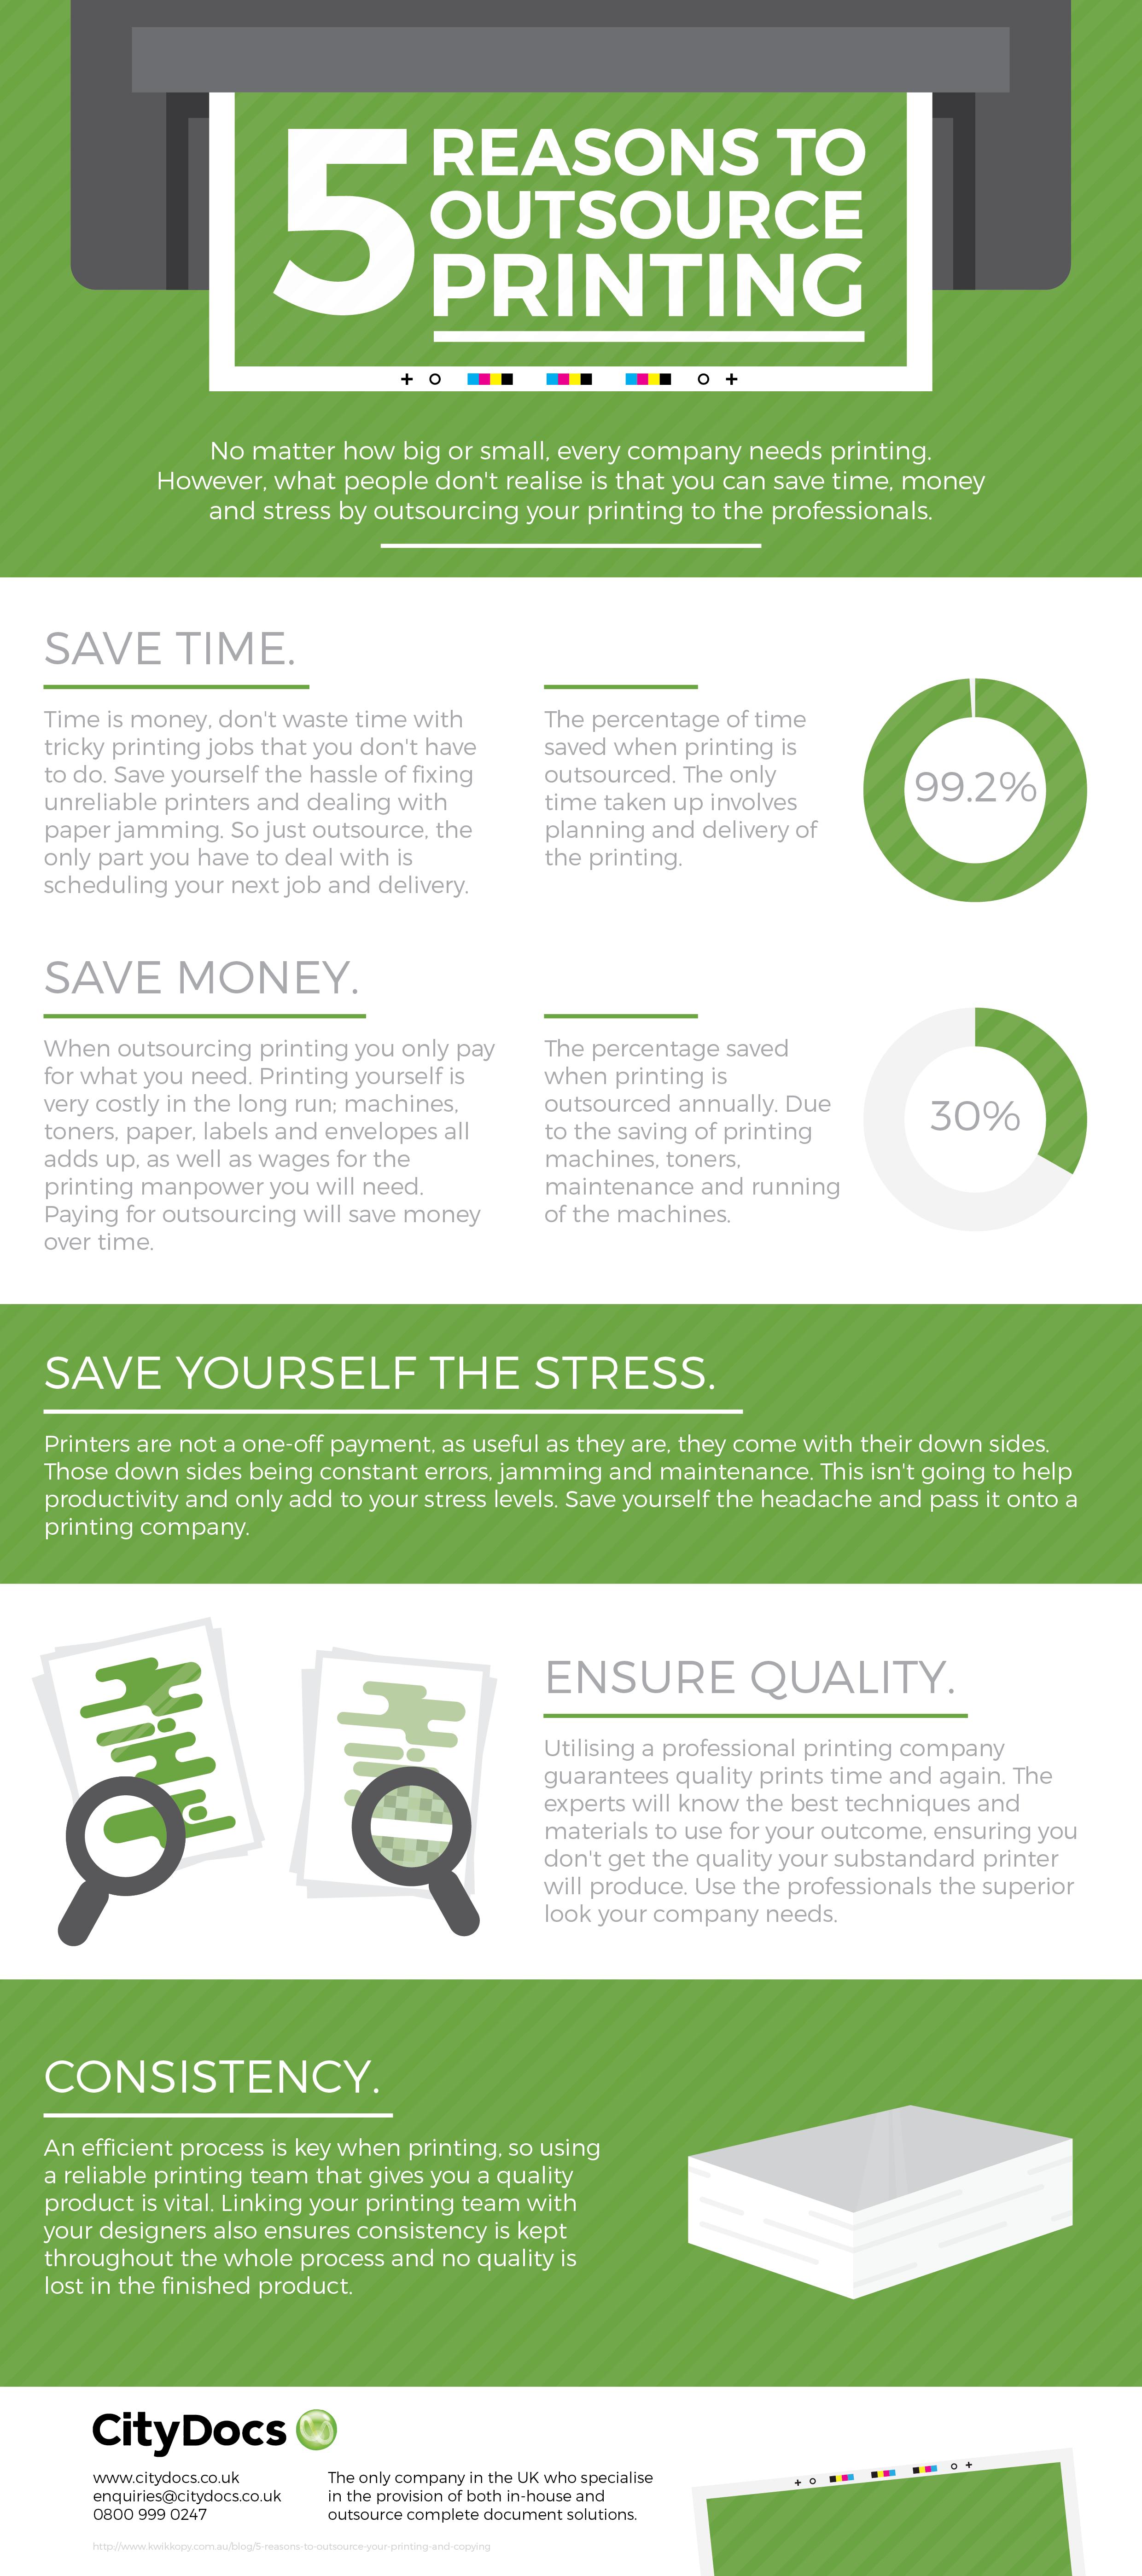 CityDocs – 5 Reasons to Outsource Printing